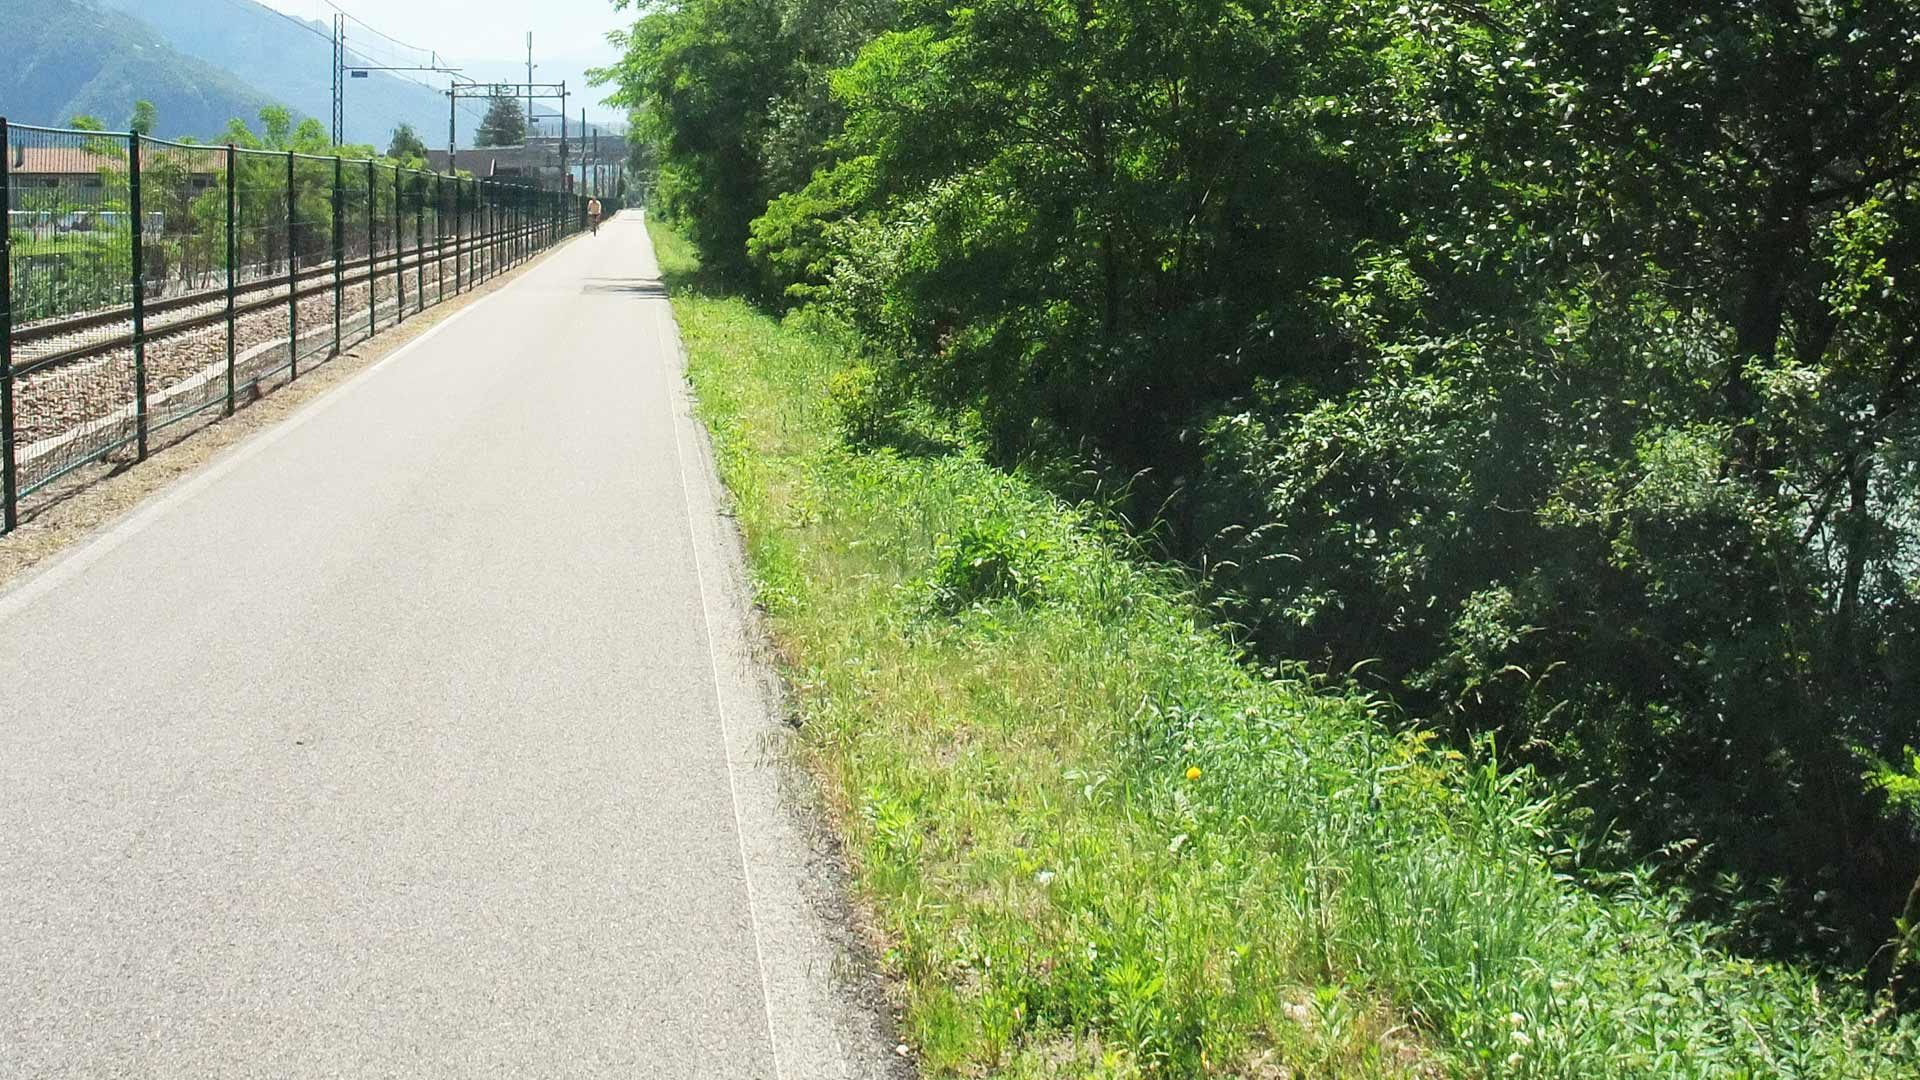 Etschtalradweg